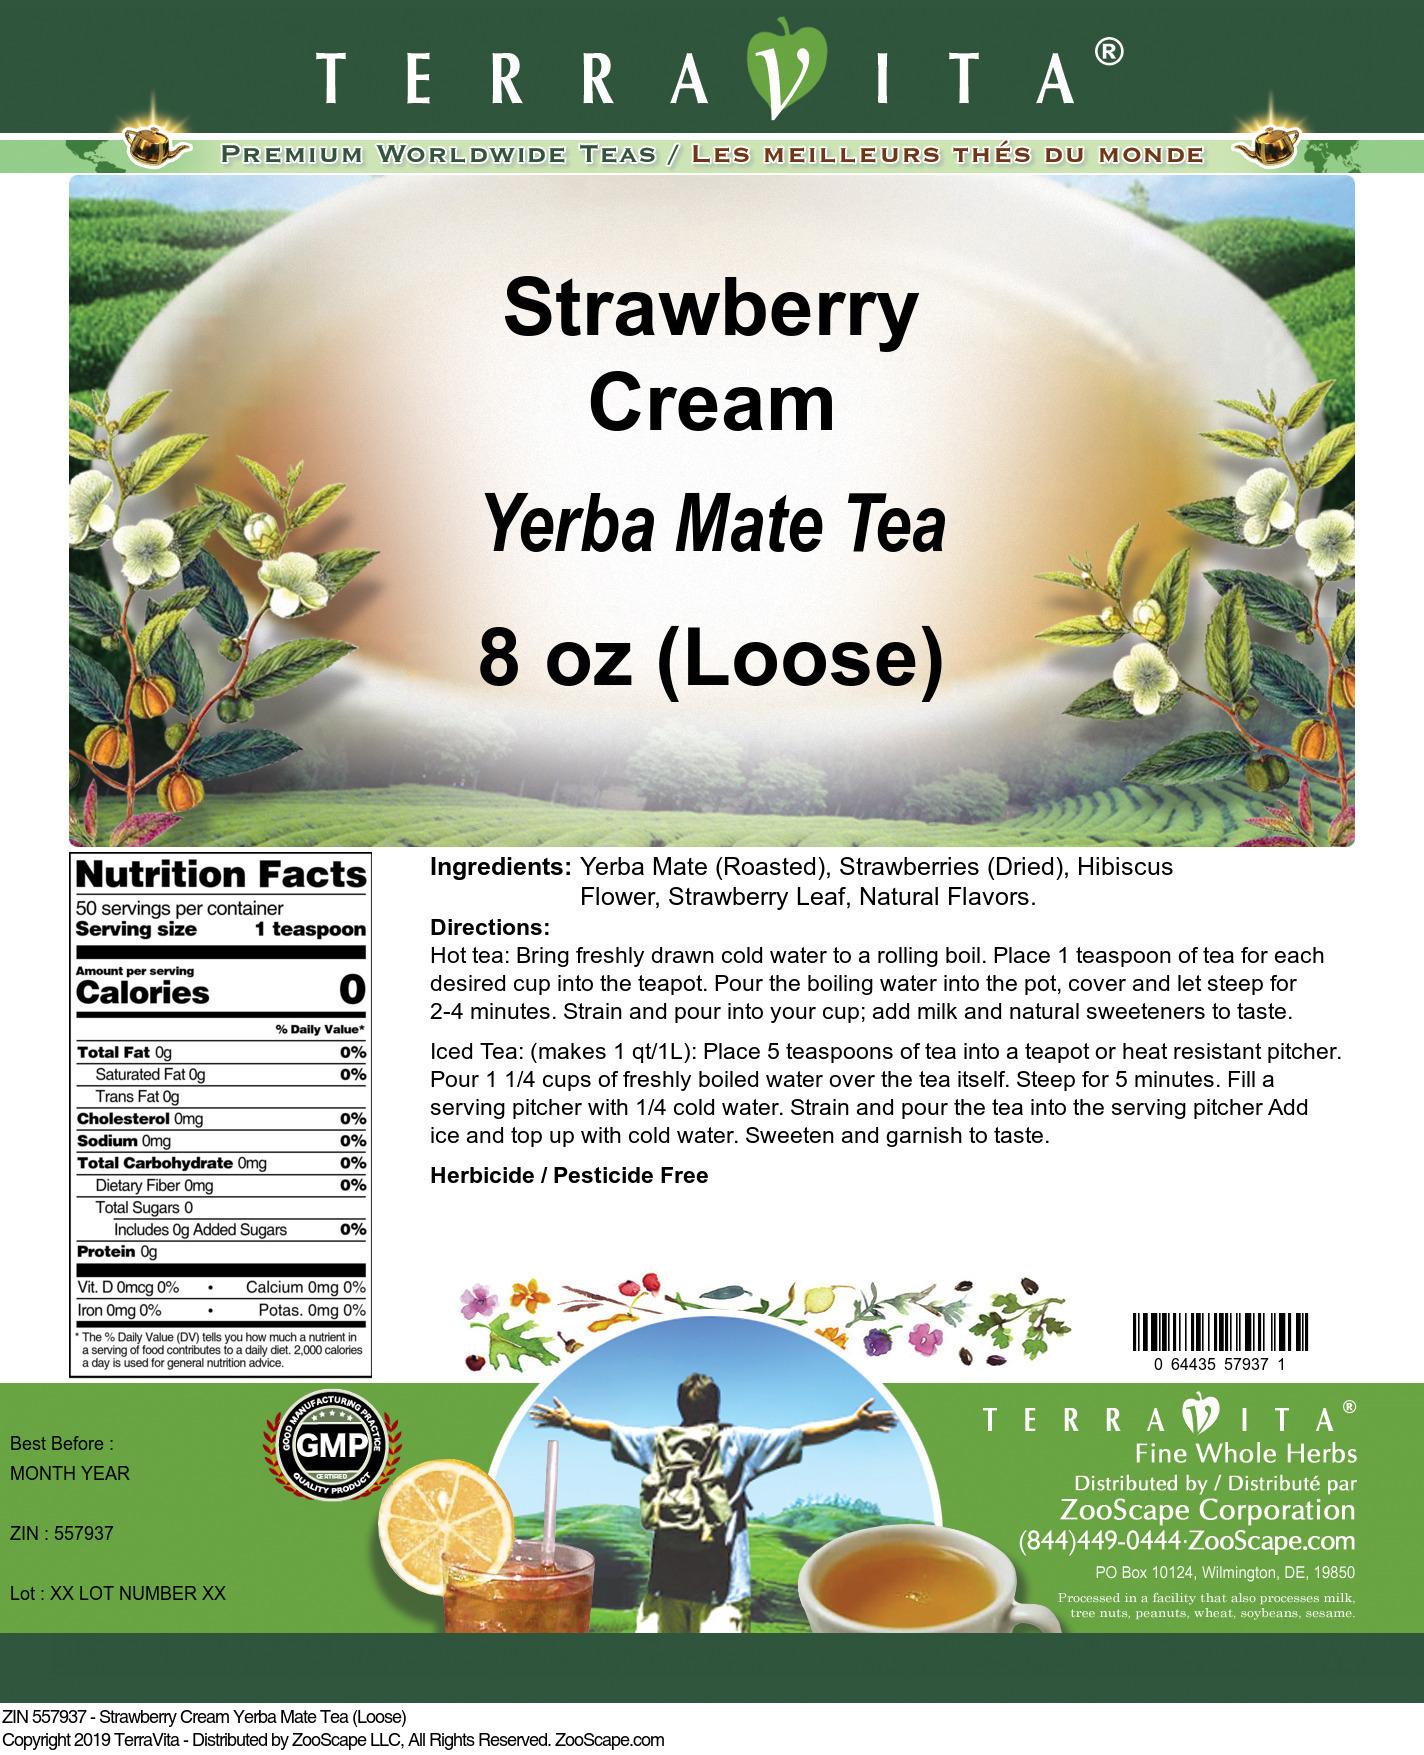 Strawberry Cream Yerba Mate Tea (Loose)